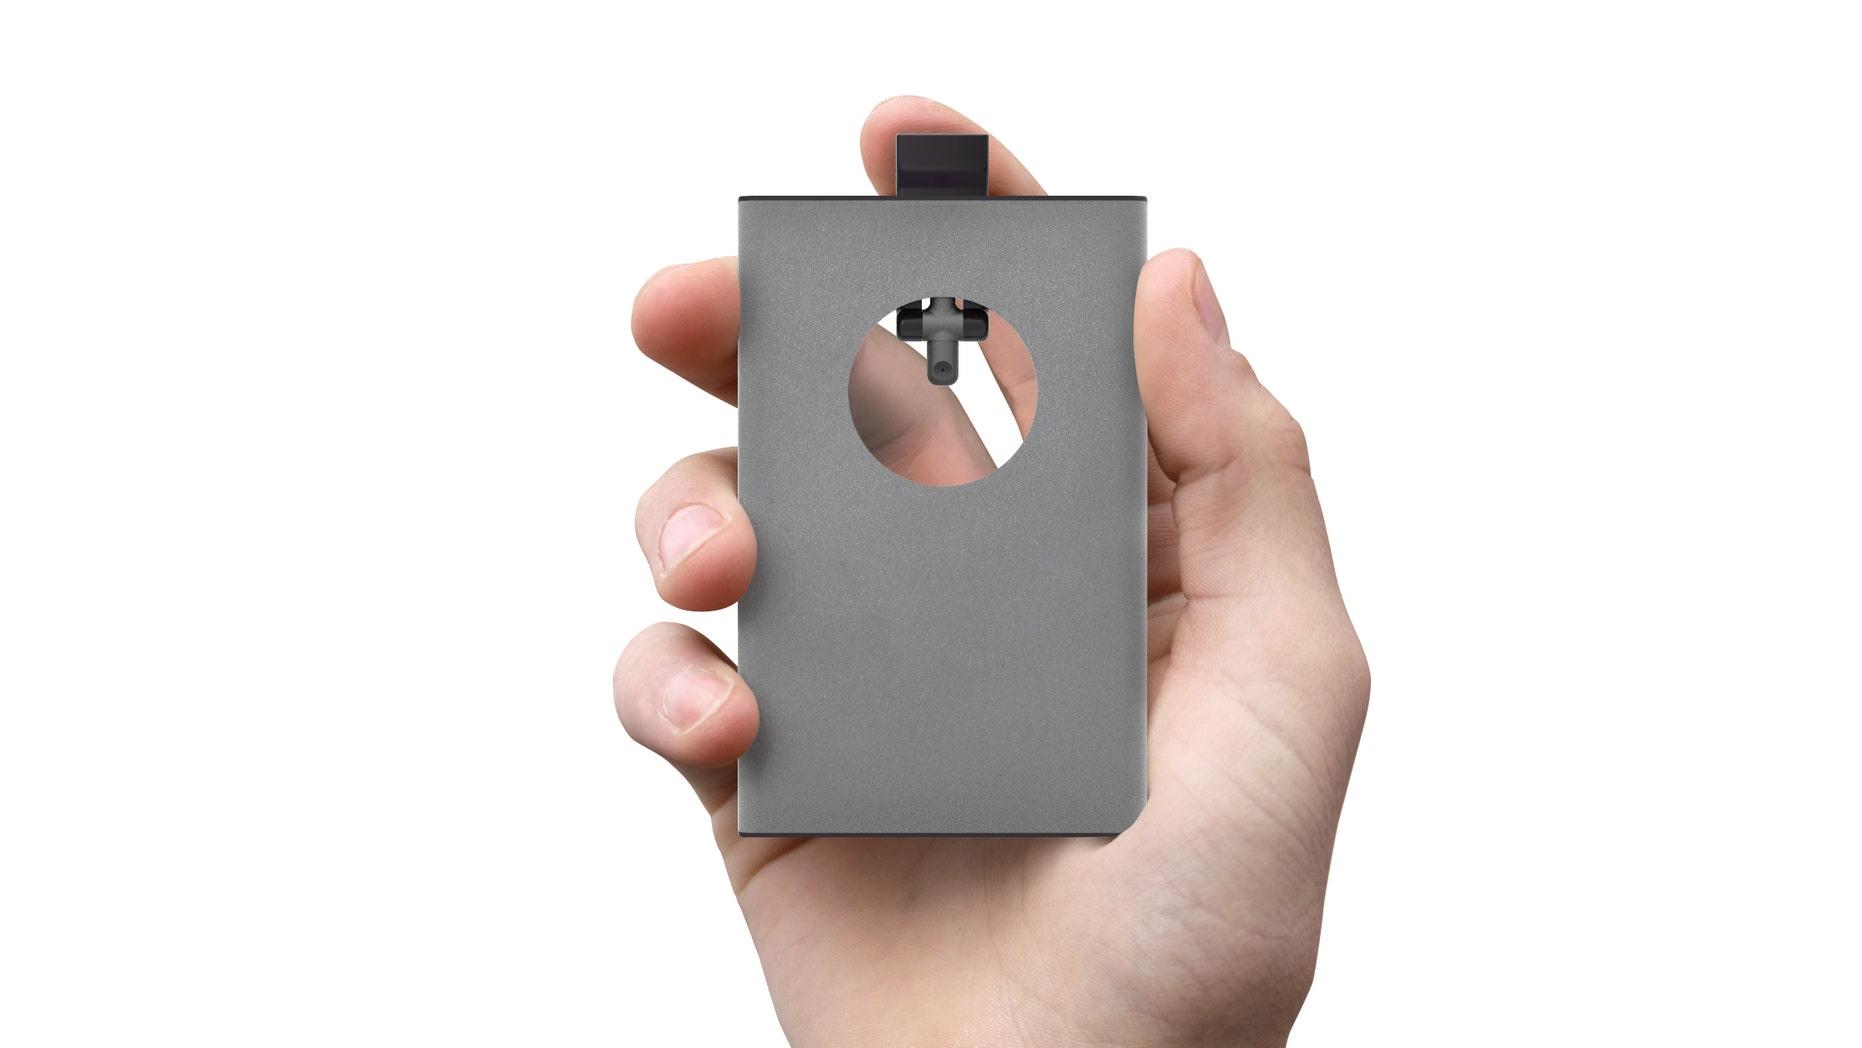 A card-size inhaler would deliver asthma medication just like its bulkier predecessors.